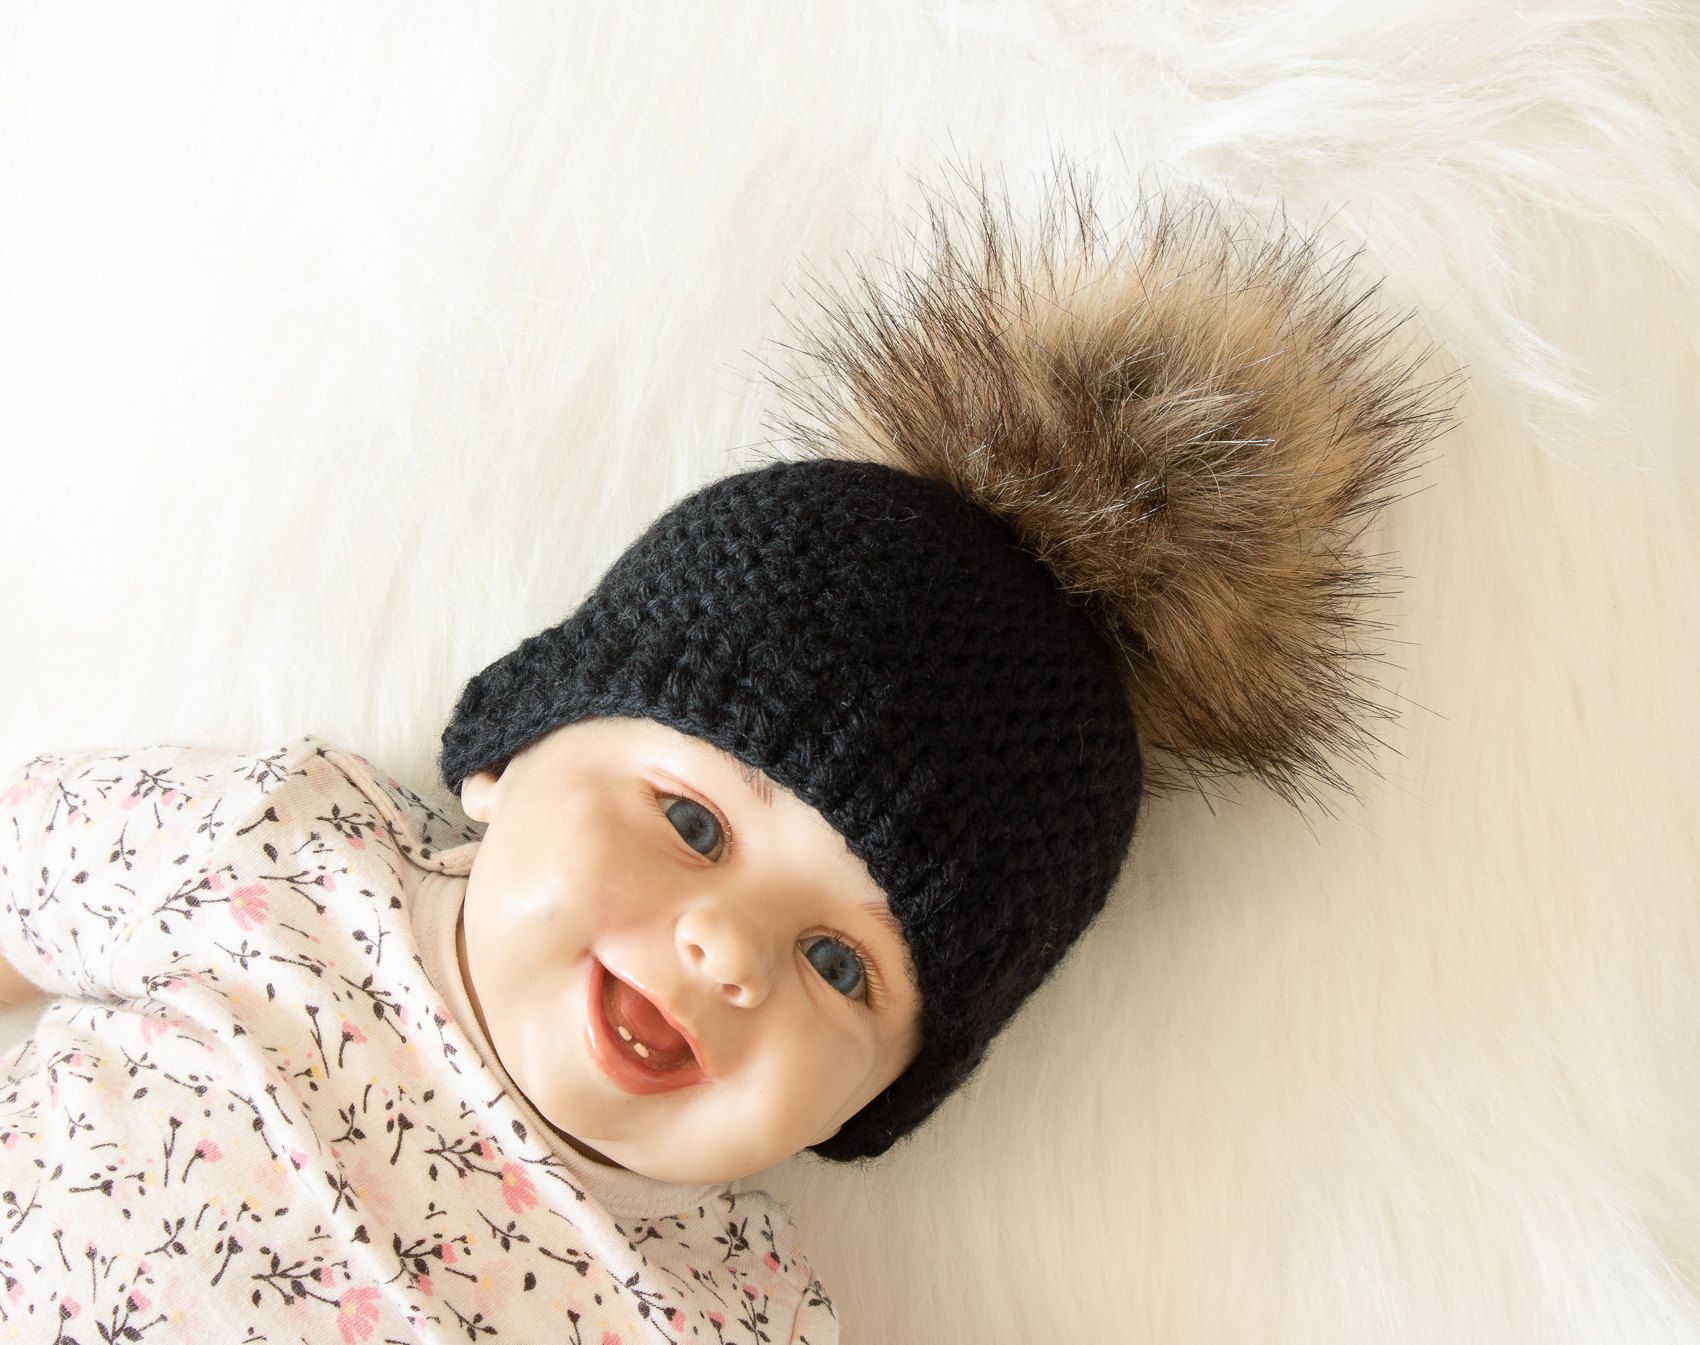 Photo Prop Toddler beanie Girls winter hat Winter hat Pom Pom Beanie Christmas gift Baby shower gift Double Pom Pom hat Pom Pom hat